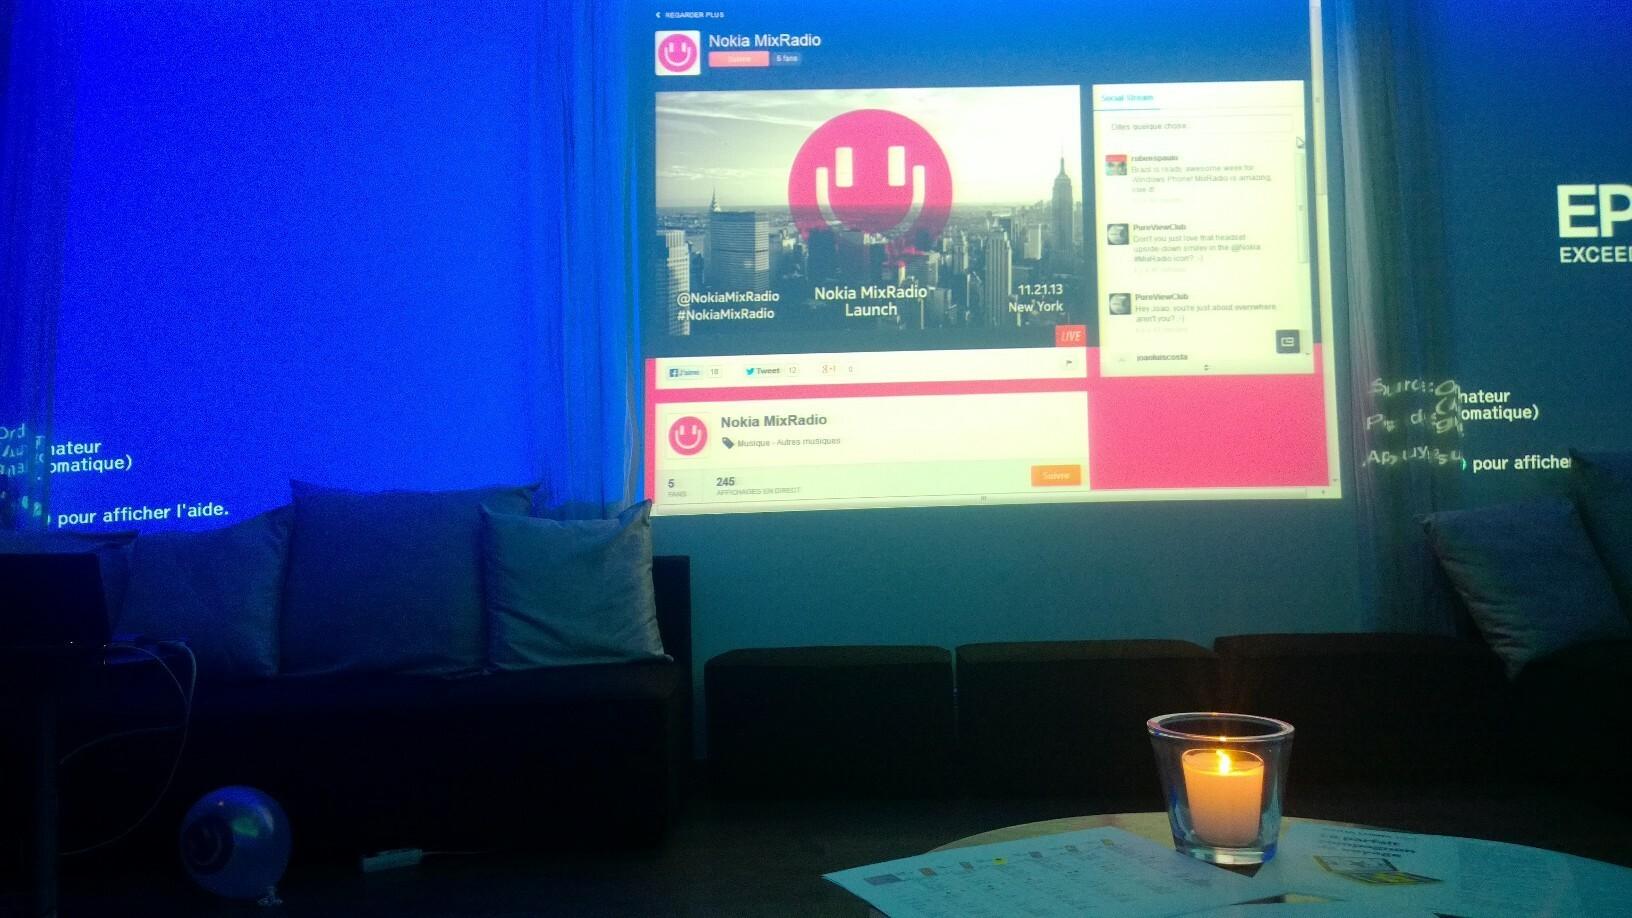 Conférence : Nokia lance MixRadio